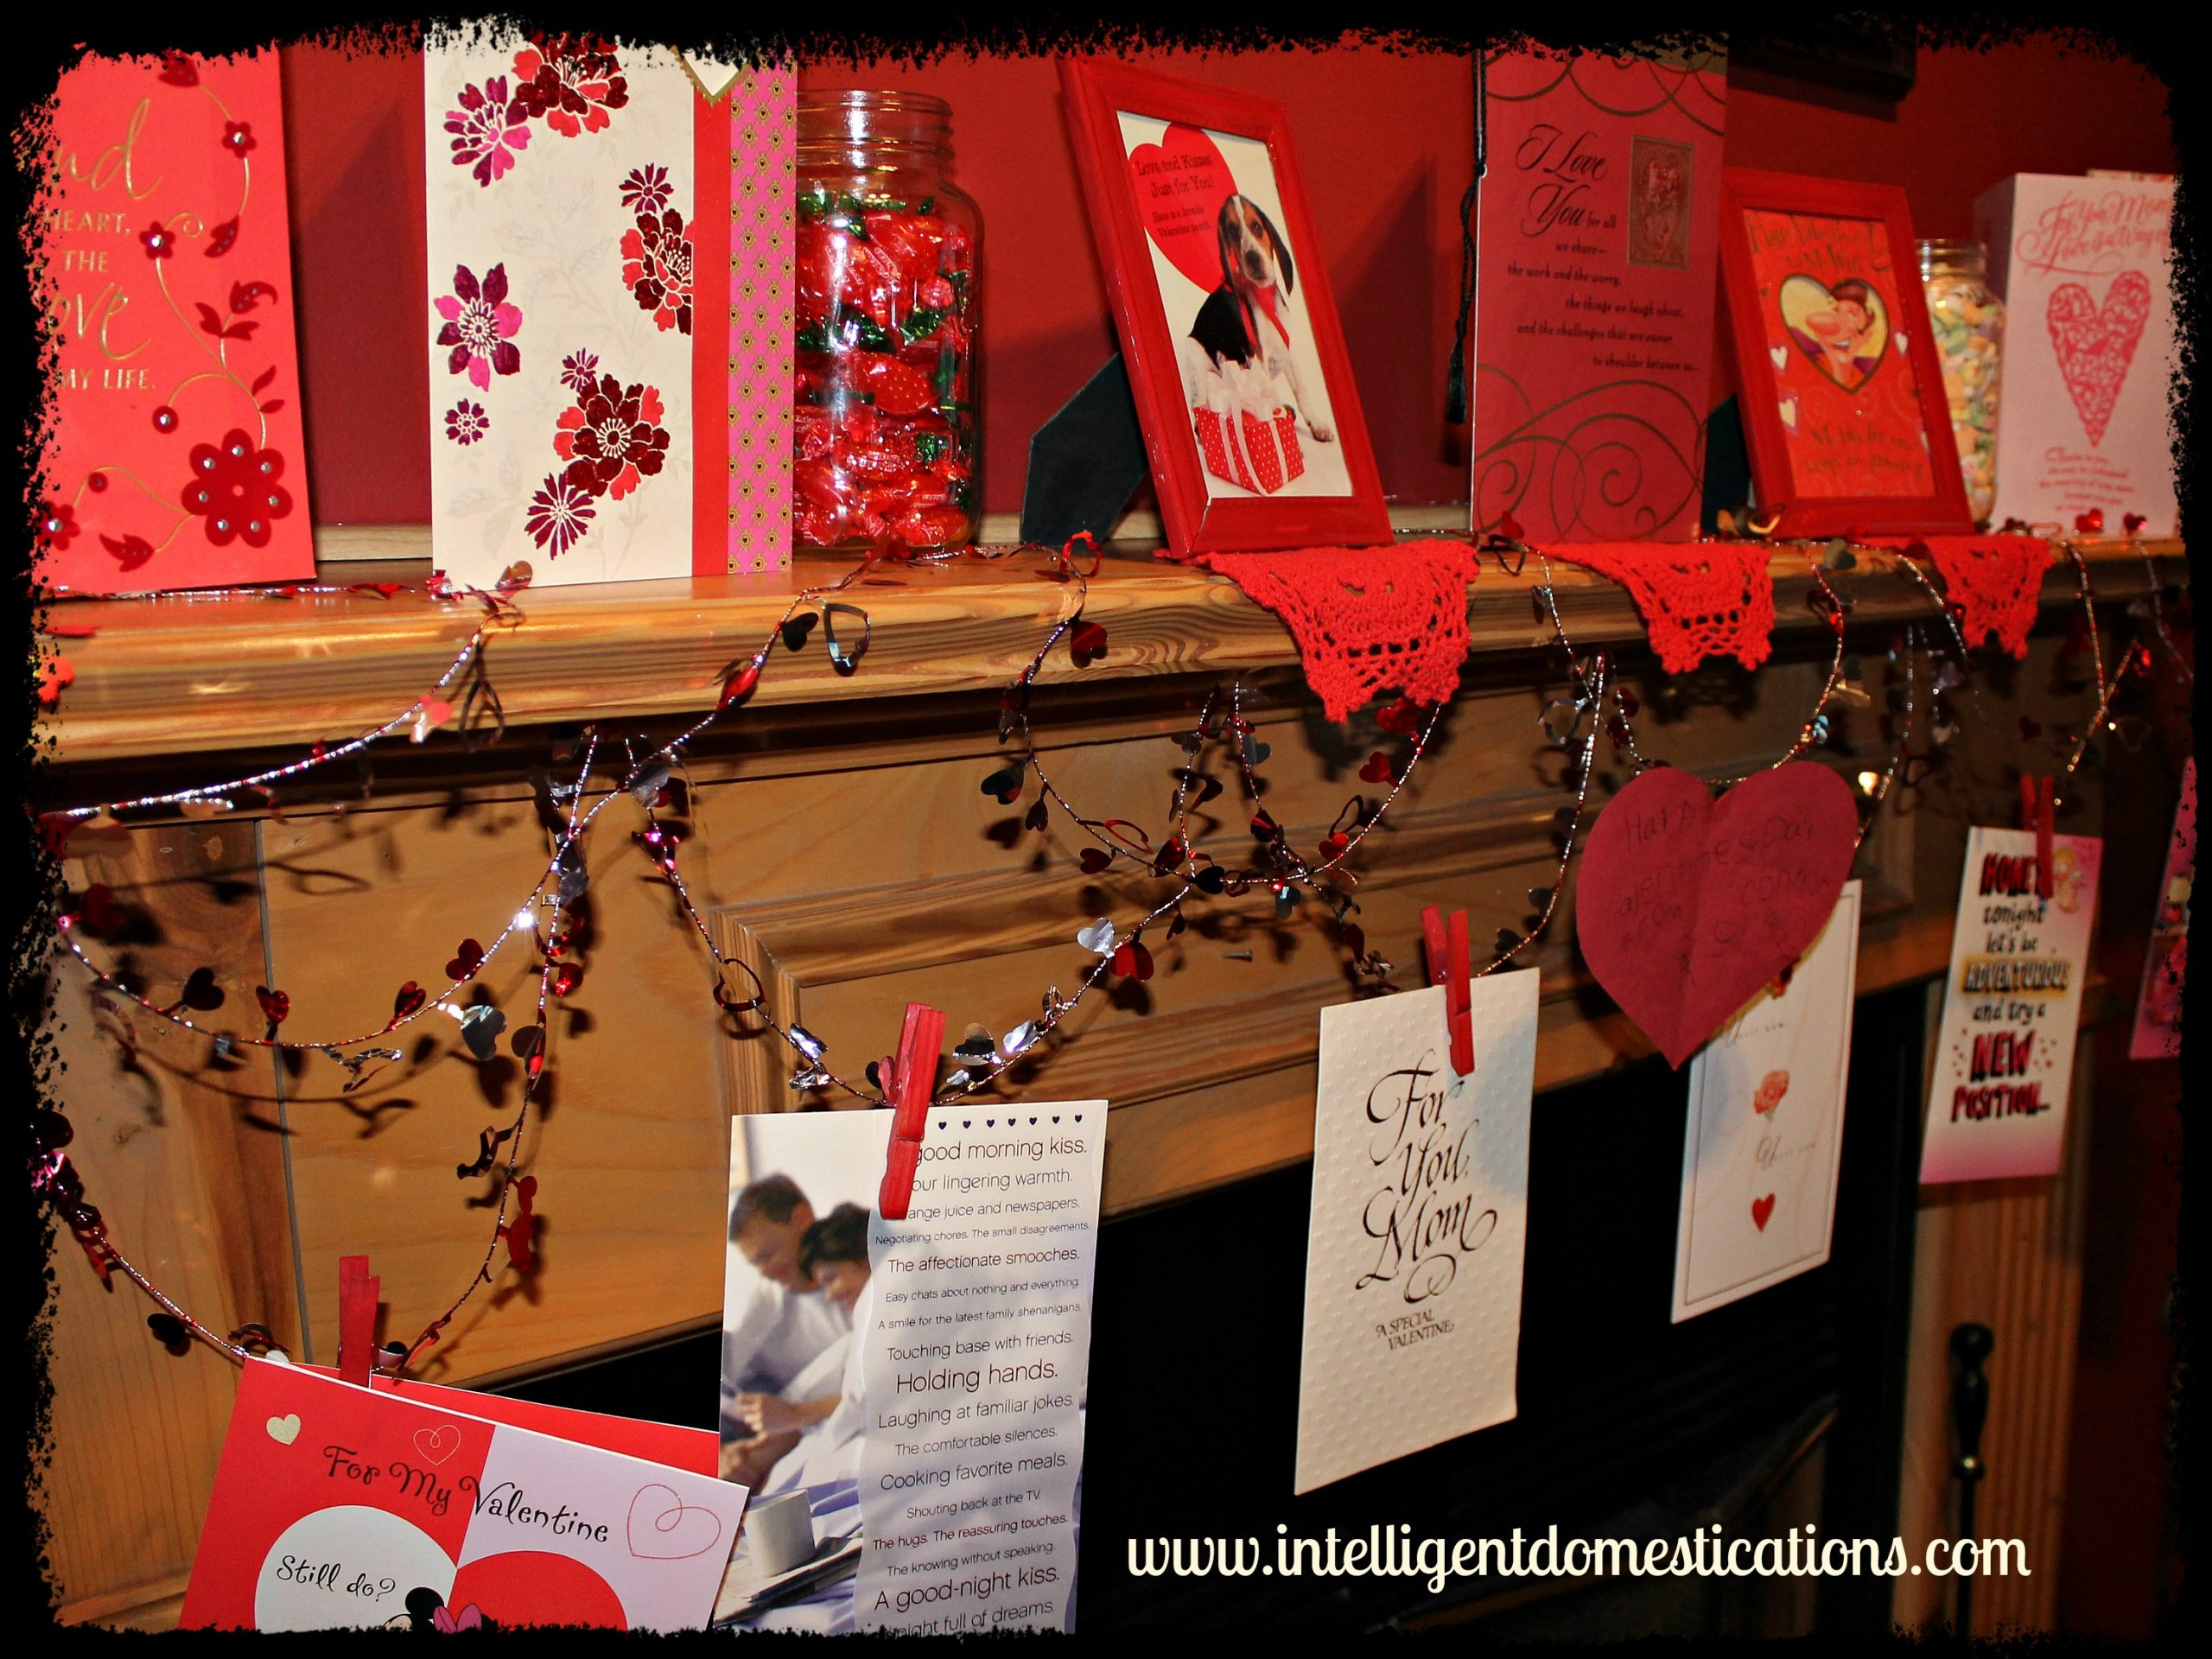 Valentine Mantlescape Clothespins Intelligentdomestications.com